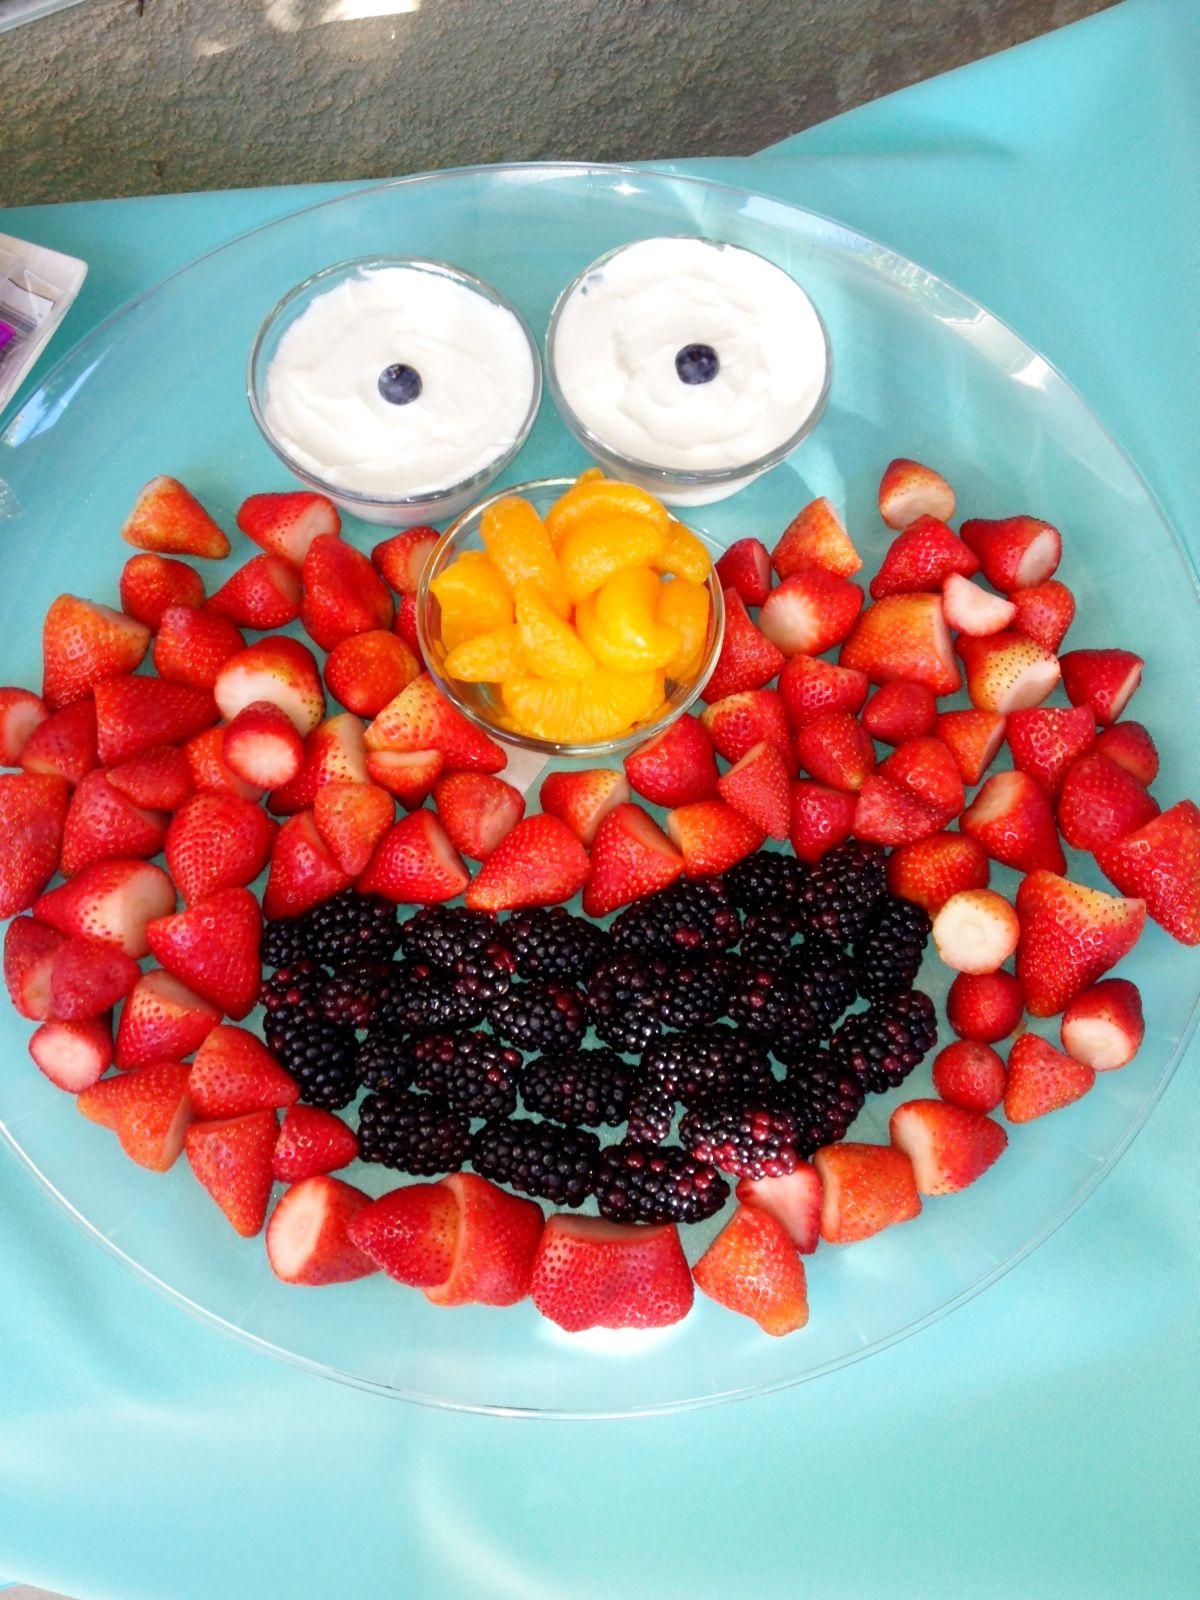 Elmo fruit platter for my friend's 2 year old | Girl ...